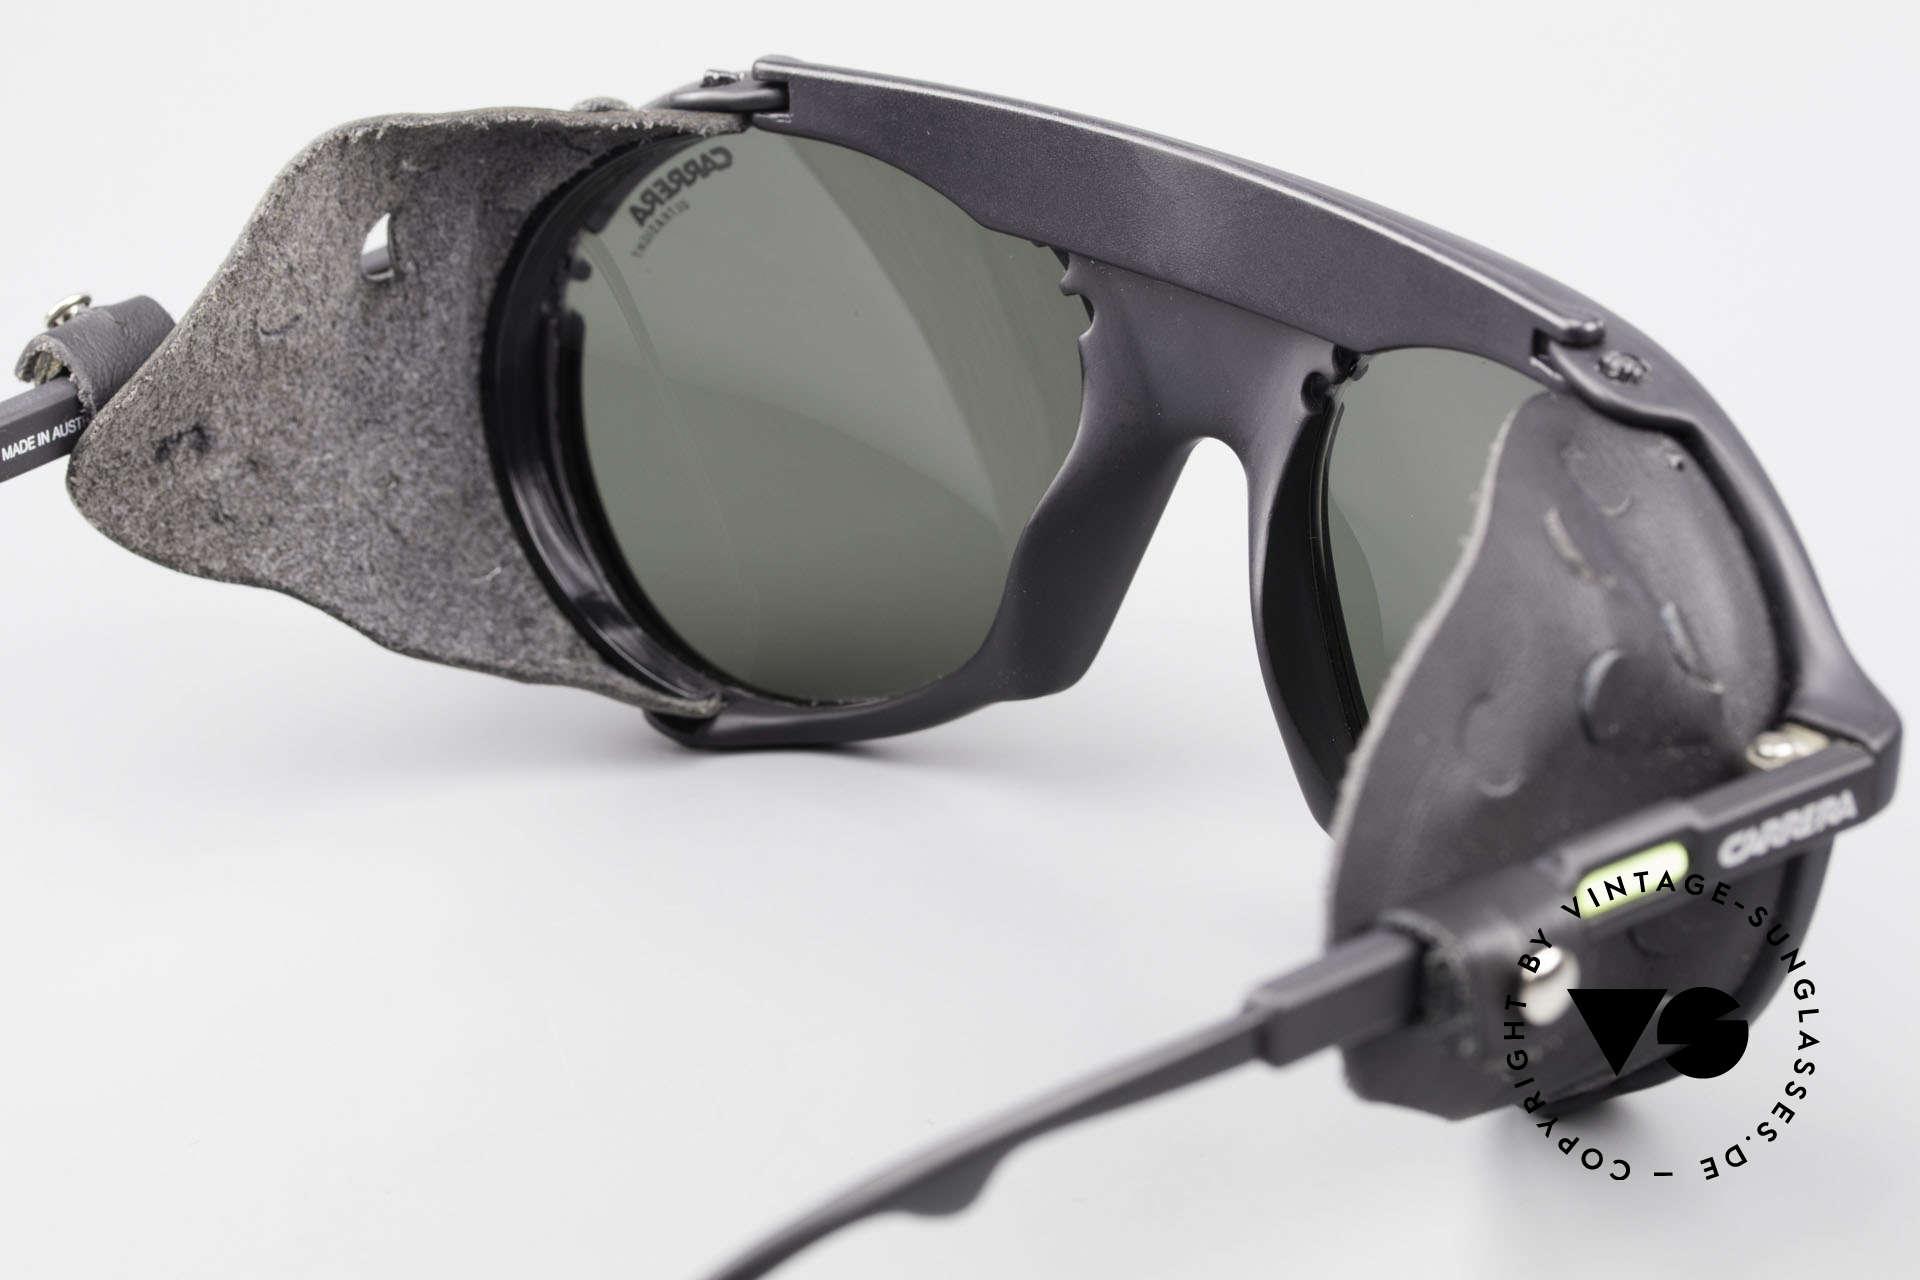 Carrera 5436 Glacier Shades Water & Ice, NO retro shades; a rare old 80's original (incl. case), Made for Men